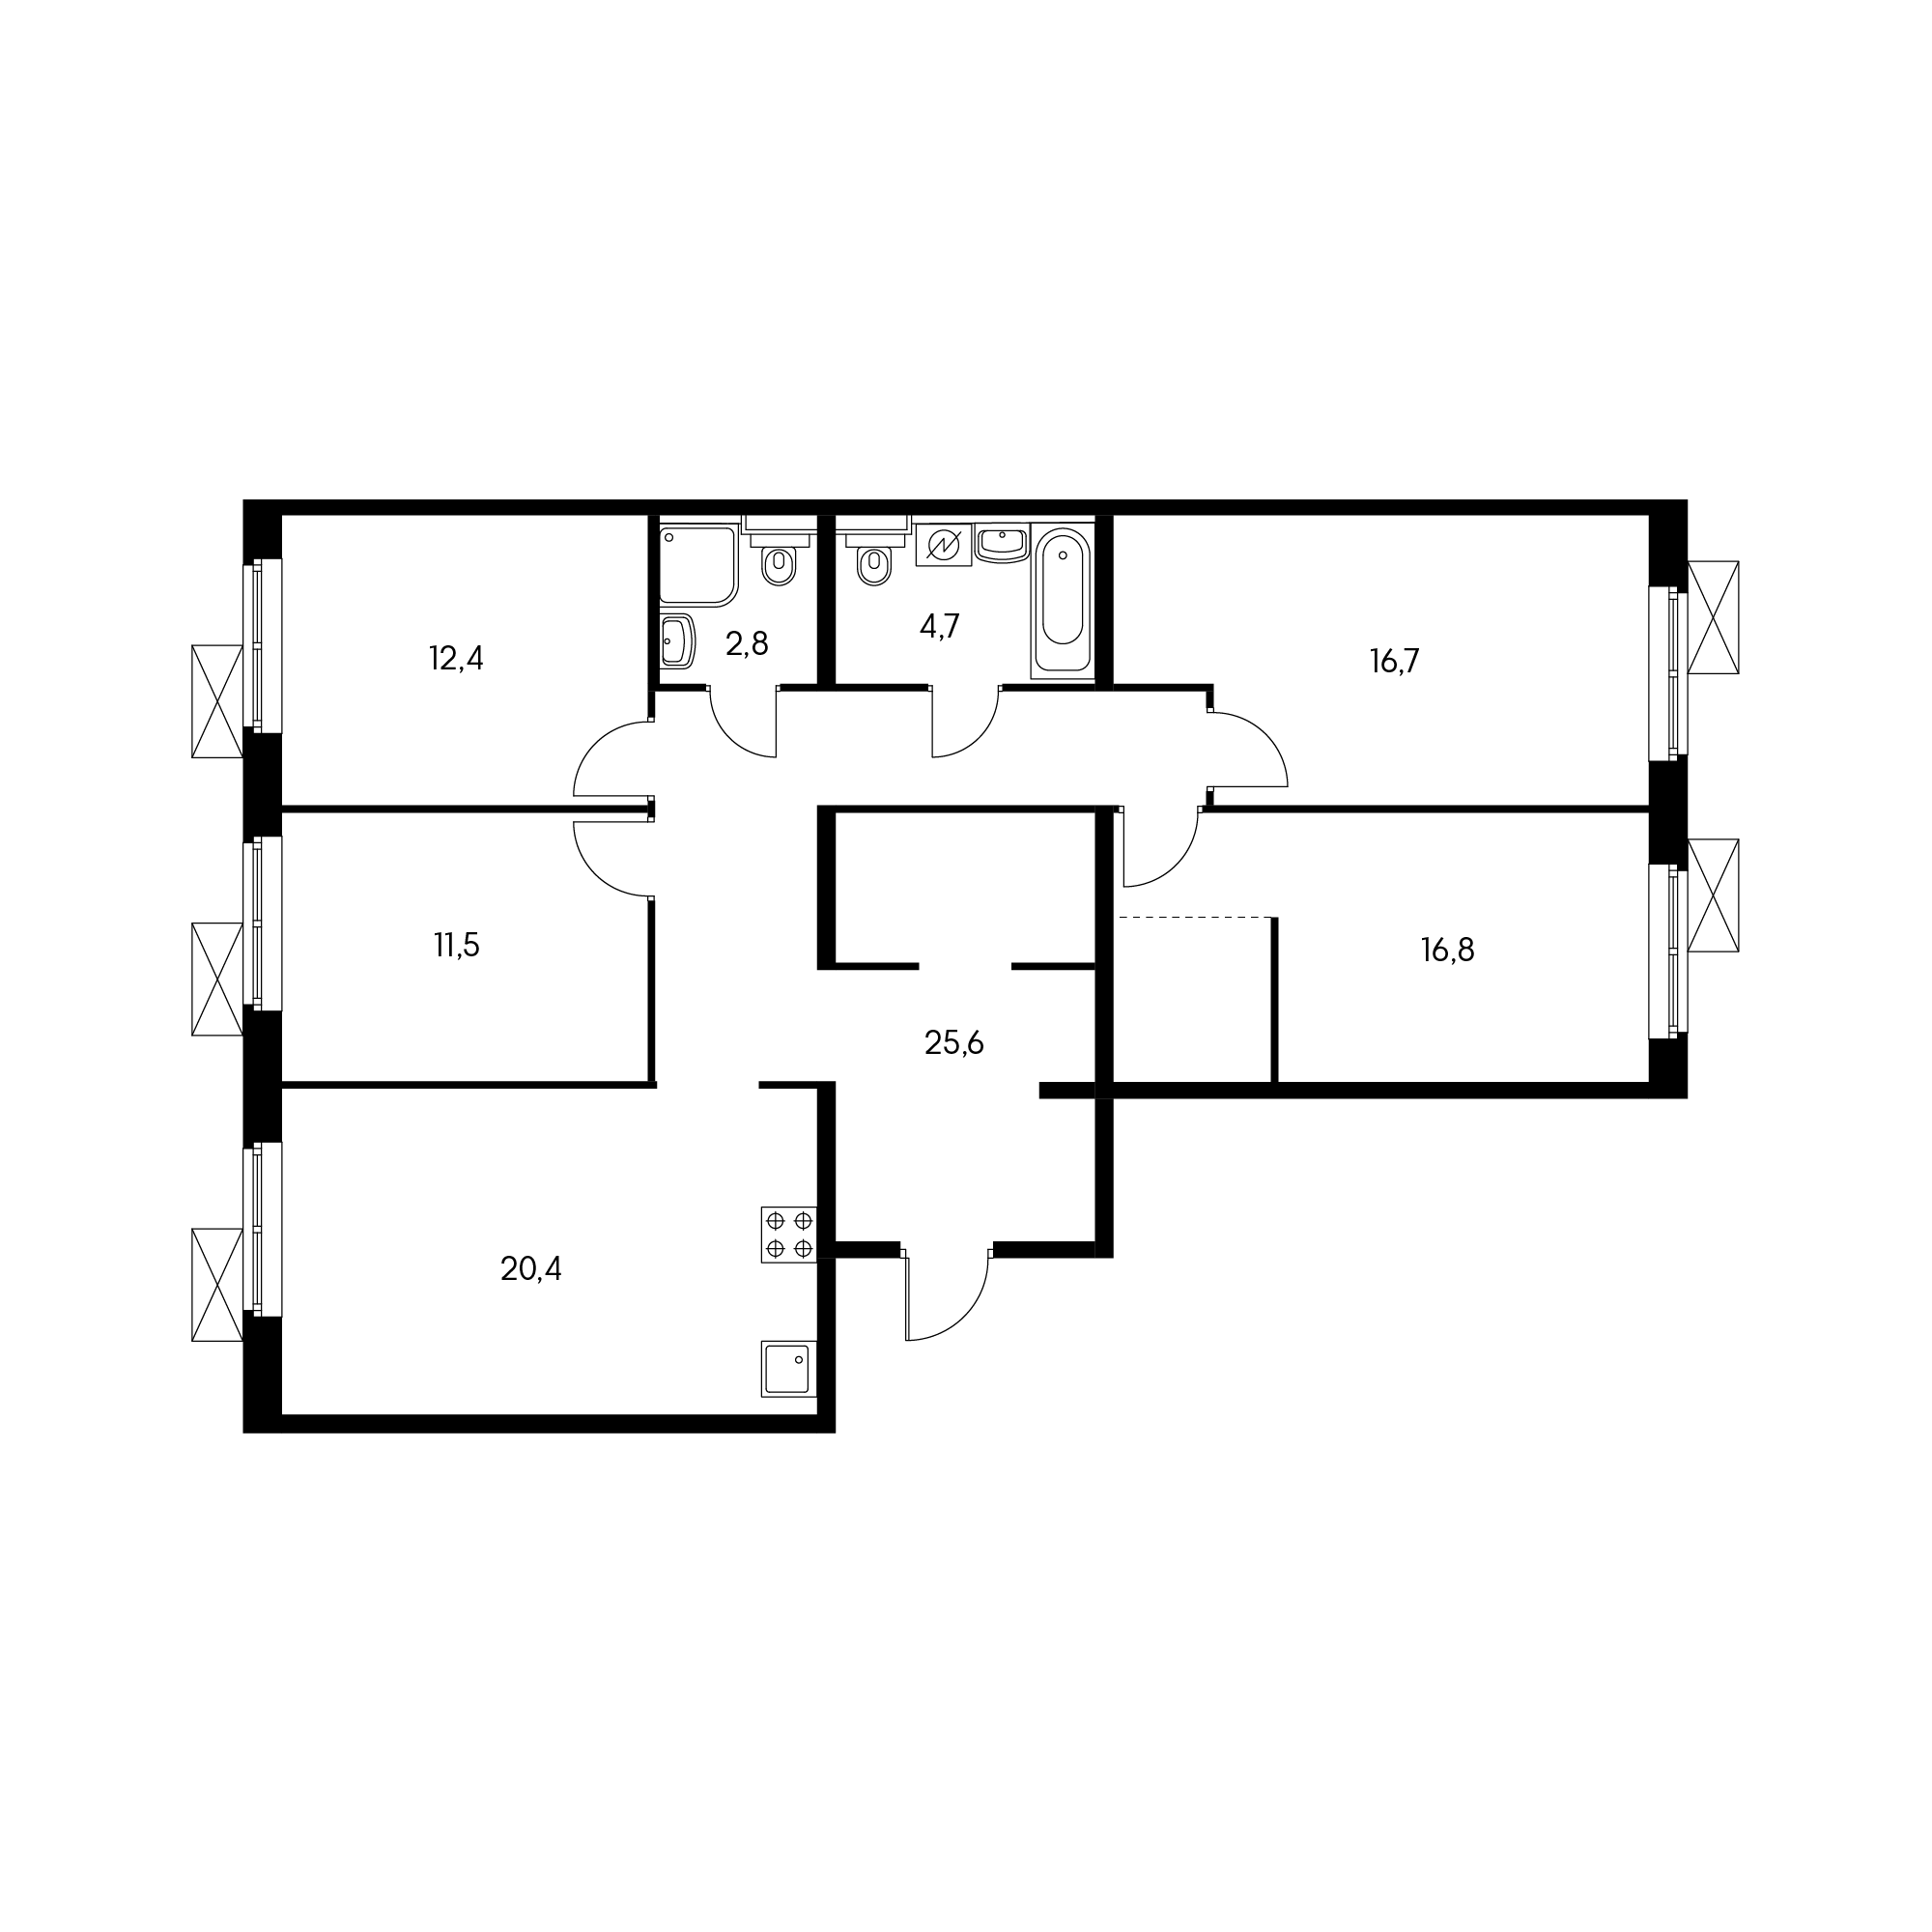 4EL6_9.9-1